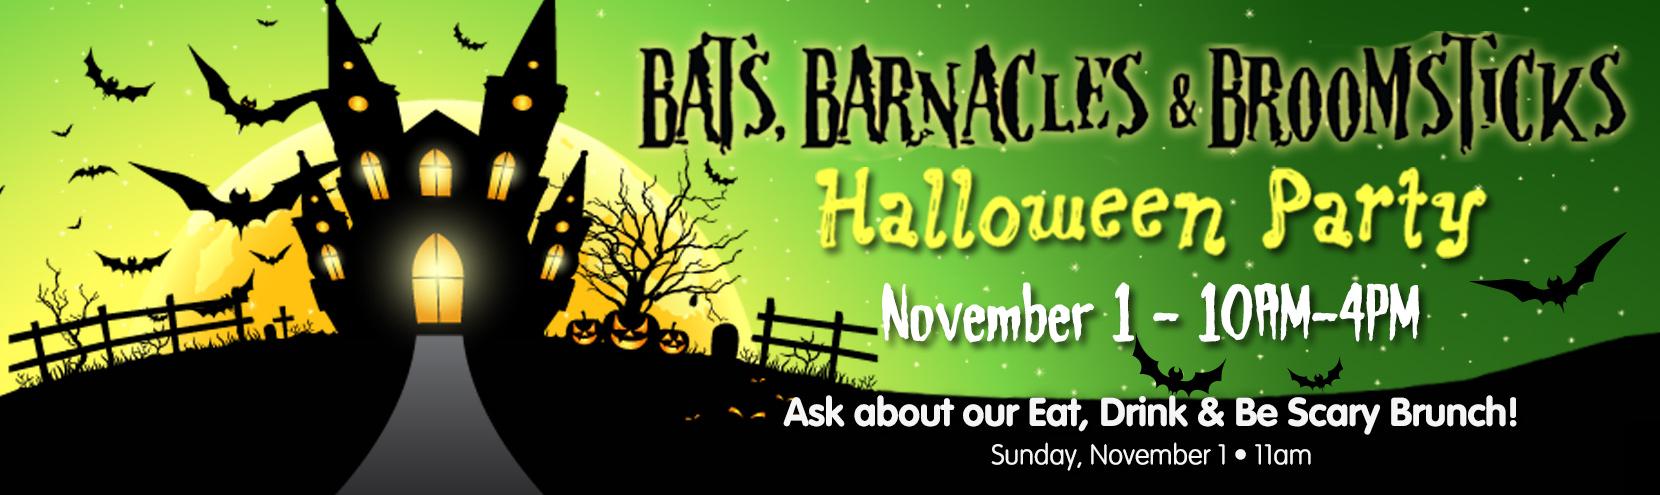 Halloween-PARTY-1660x495.jpg